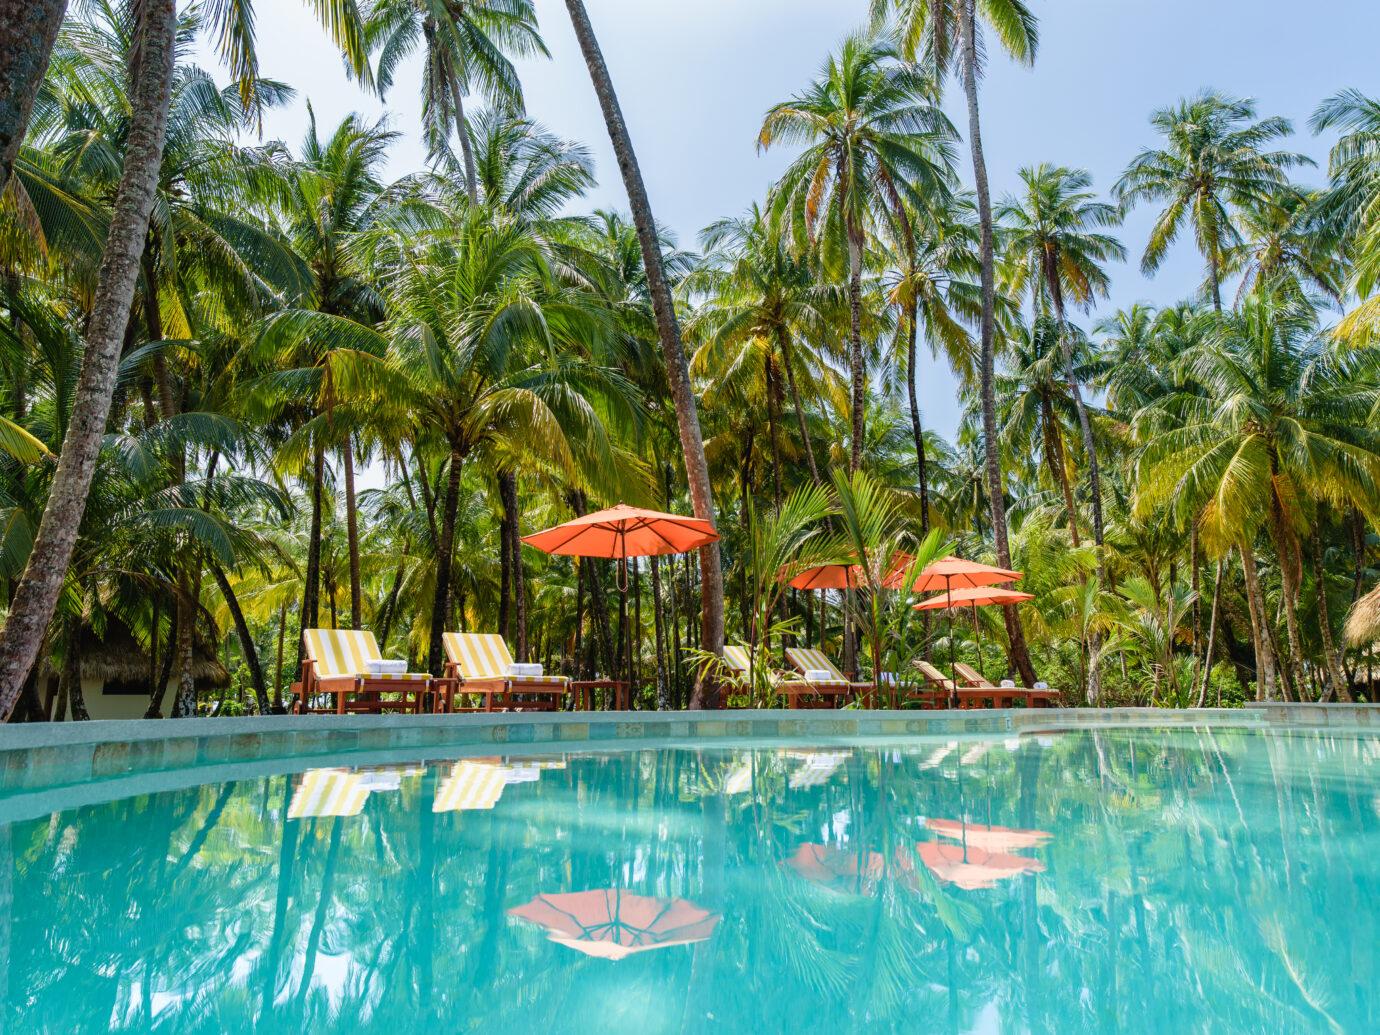 Pool at Calala Island, Nicaragua